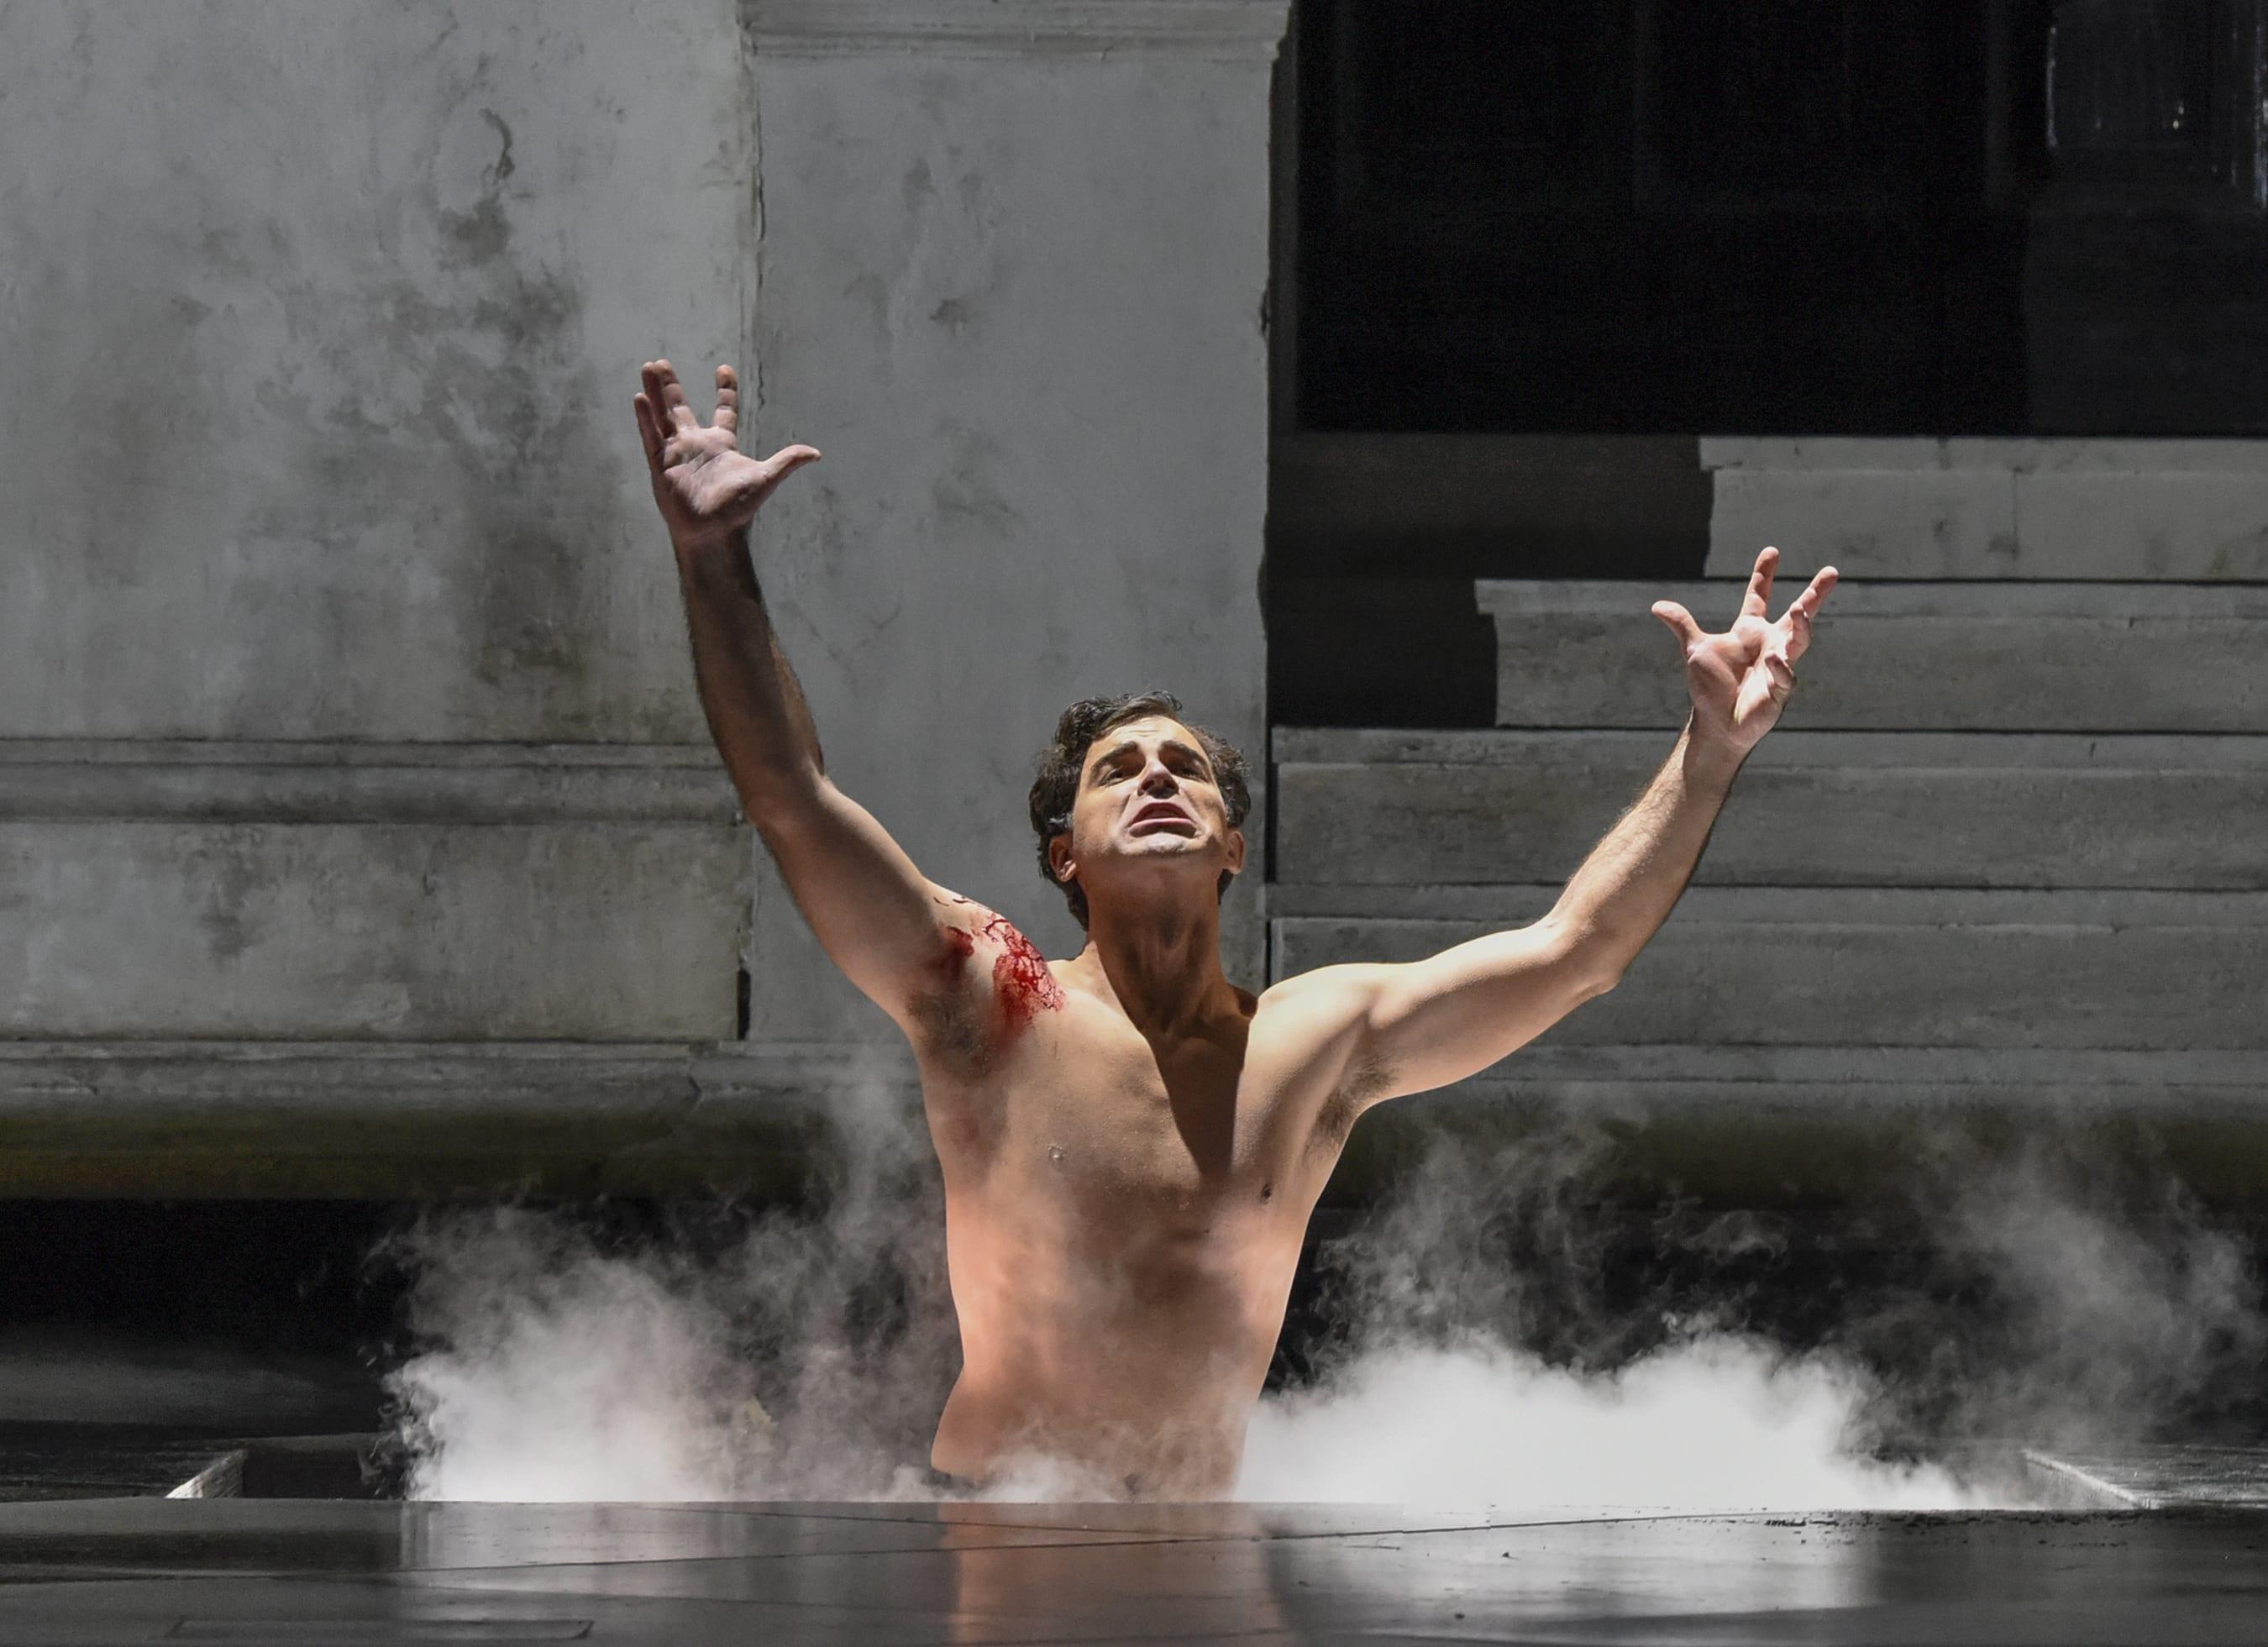 OPERA REVIEW: A triumphant 'Don Giovanni'